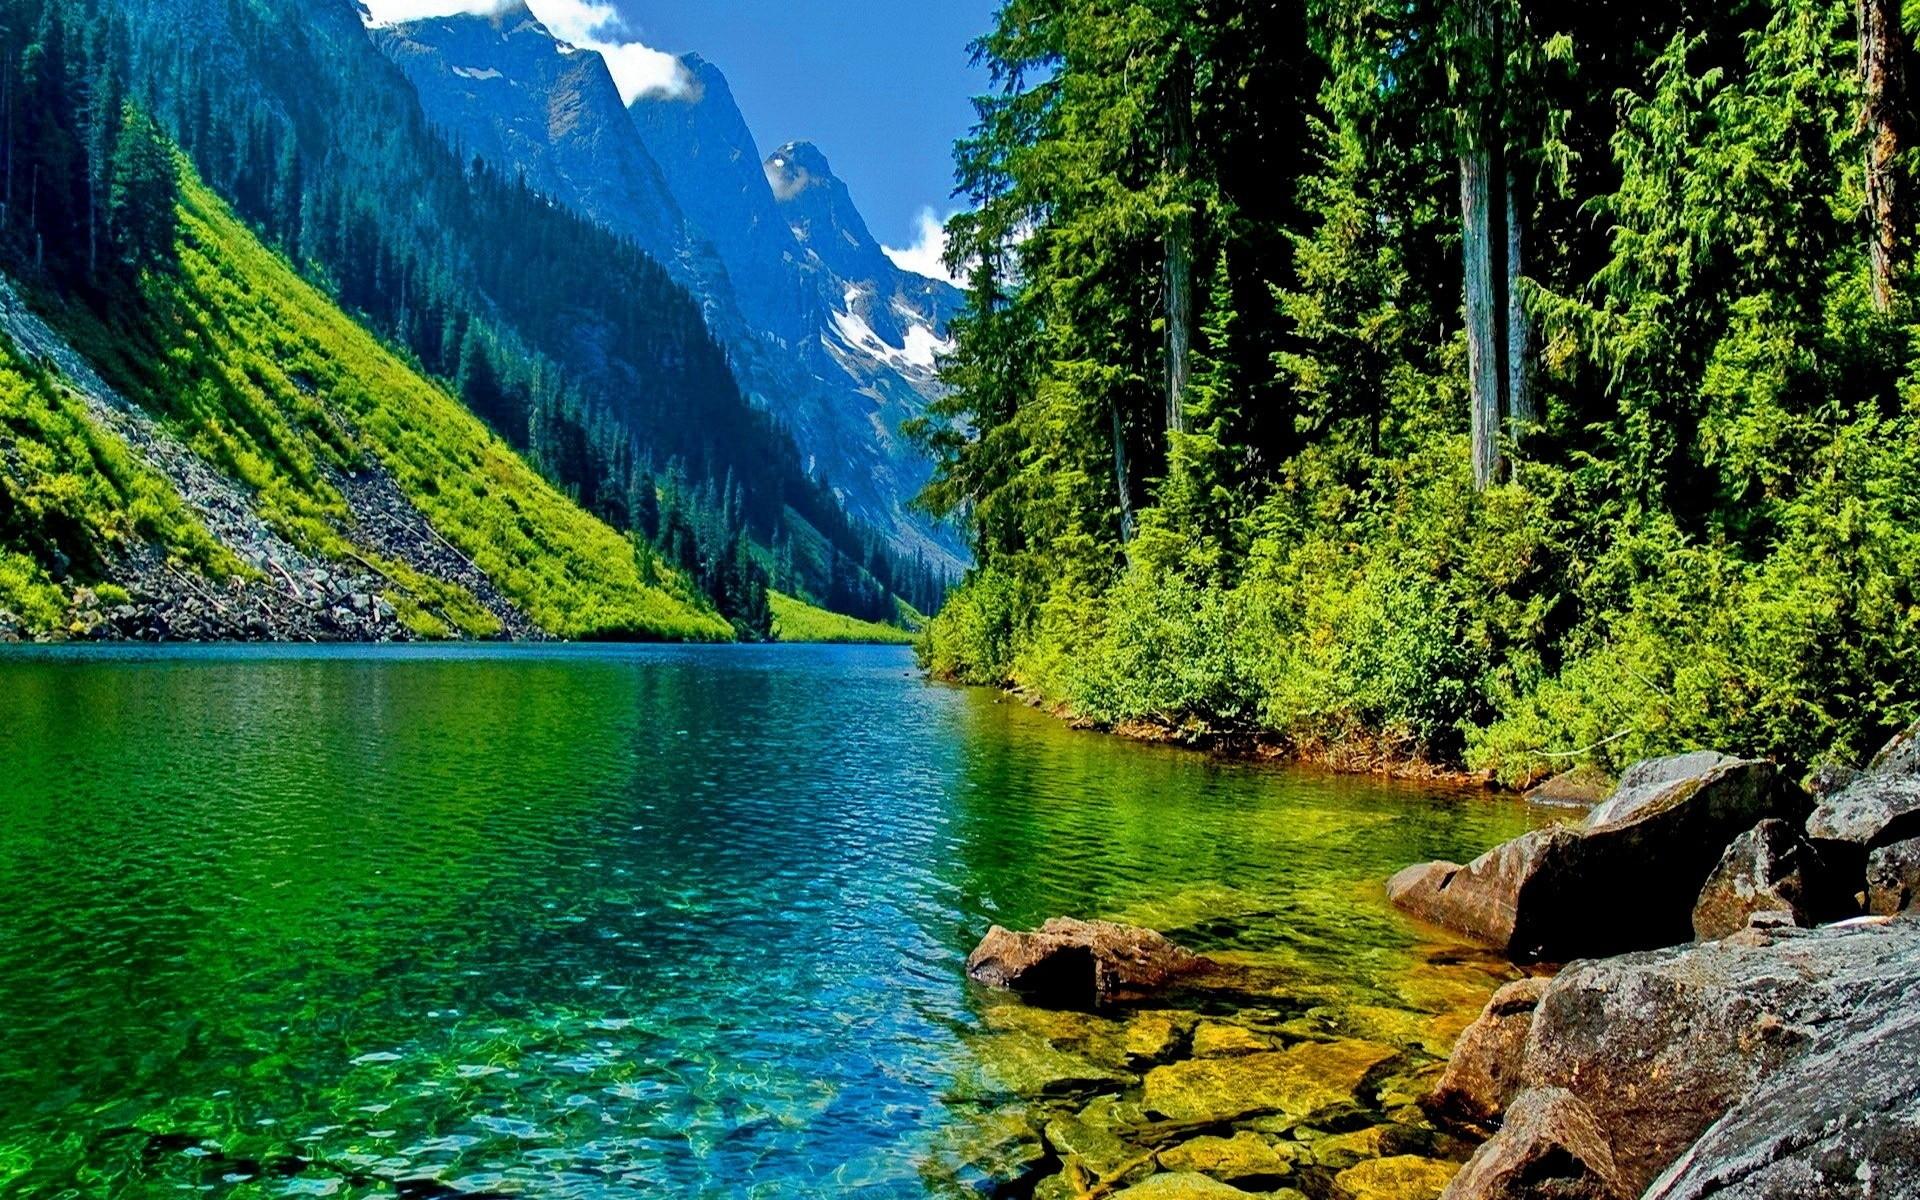 Nice desktop backgrounds 57 images - Nature wallpaper collection zip ...